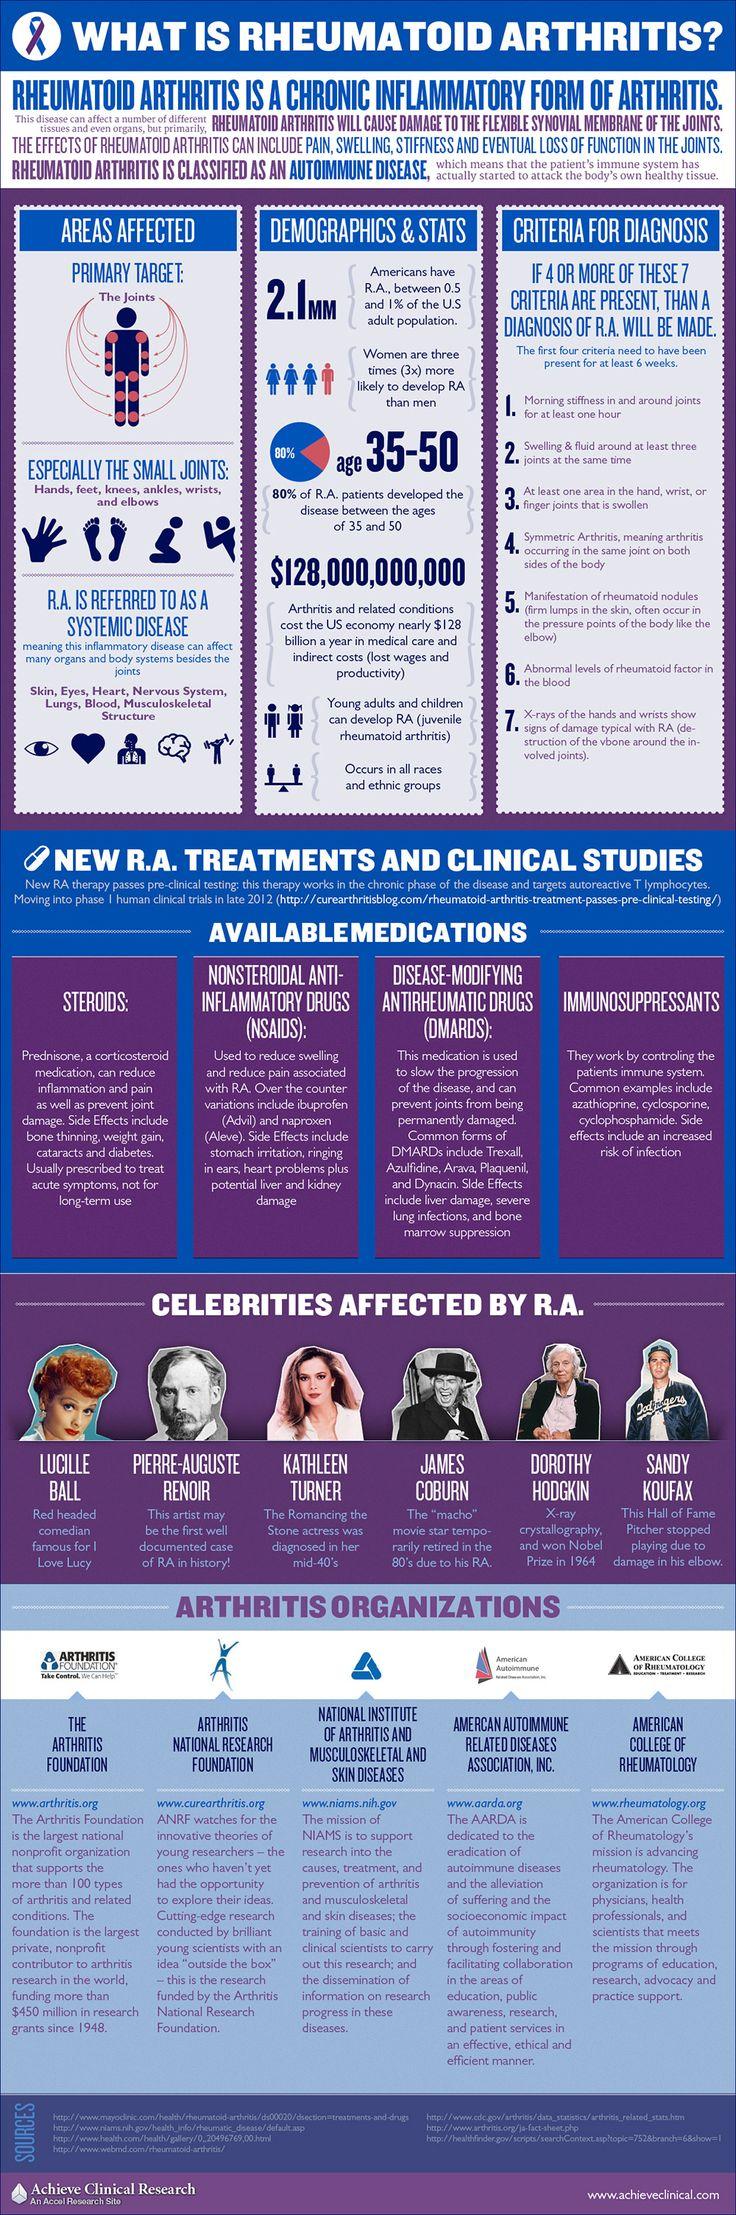 Arthritis Research at the Johns Hopkins Arthritis Center